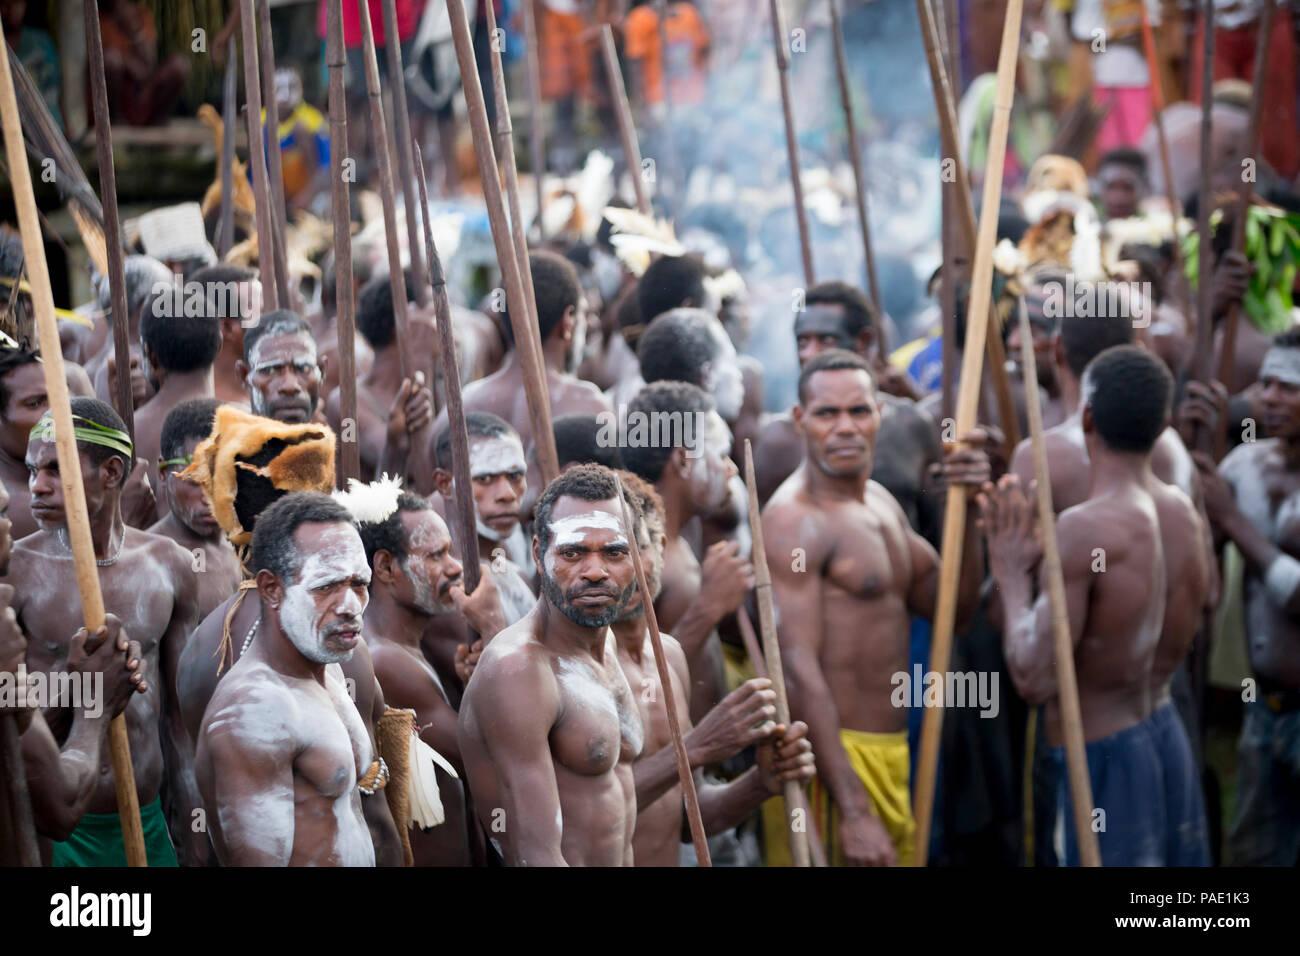 Tribal performance, West Papua - Stock Image